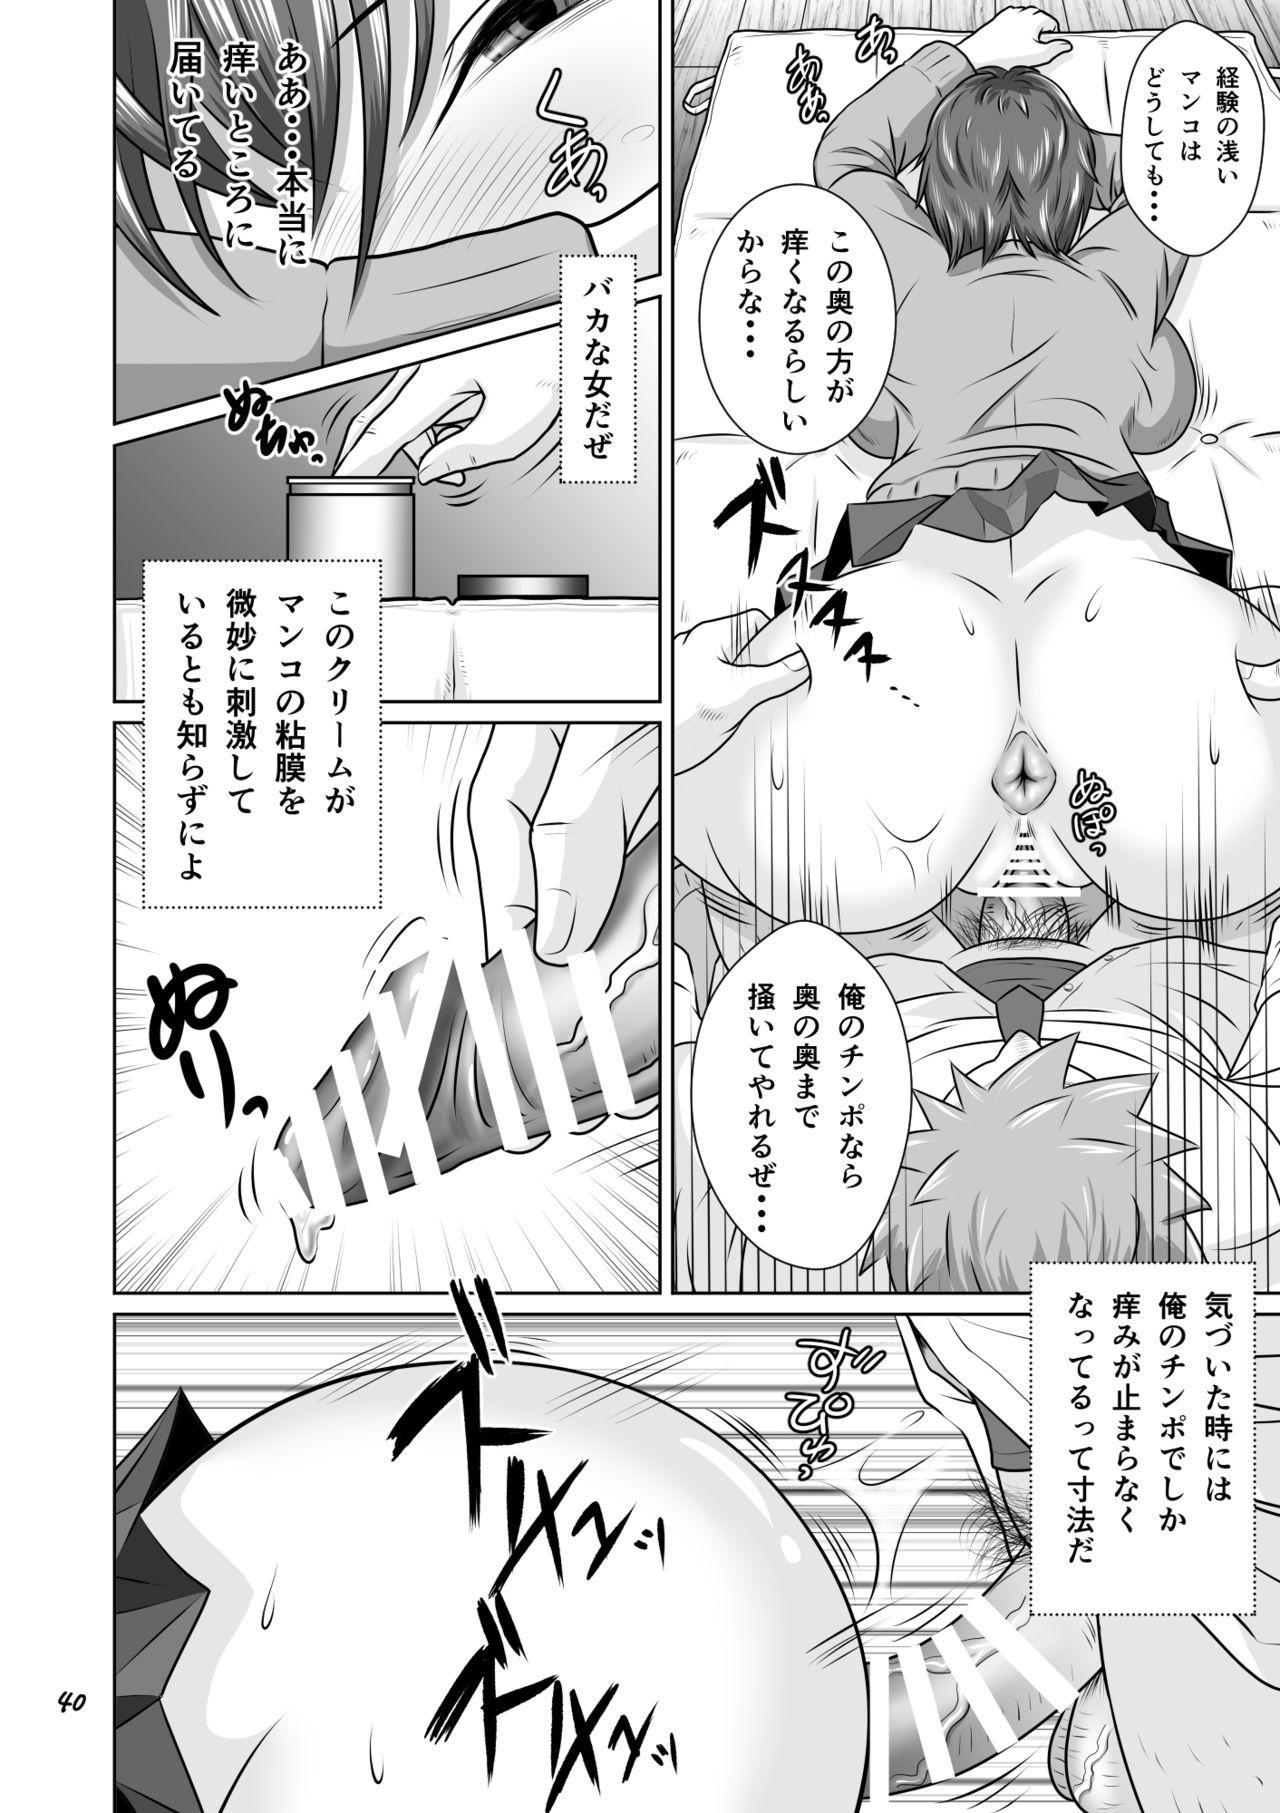 Netorare Osananajimi Haruka-chan Kiki Ippatsu!! 40